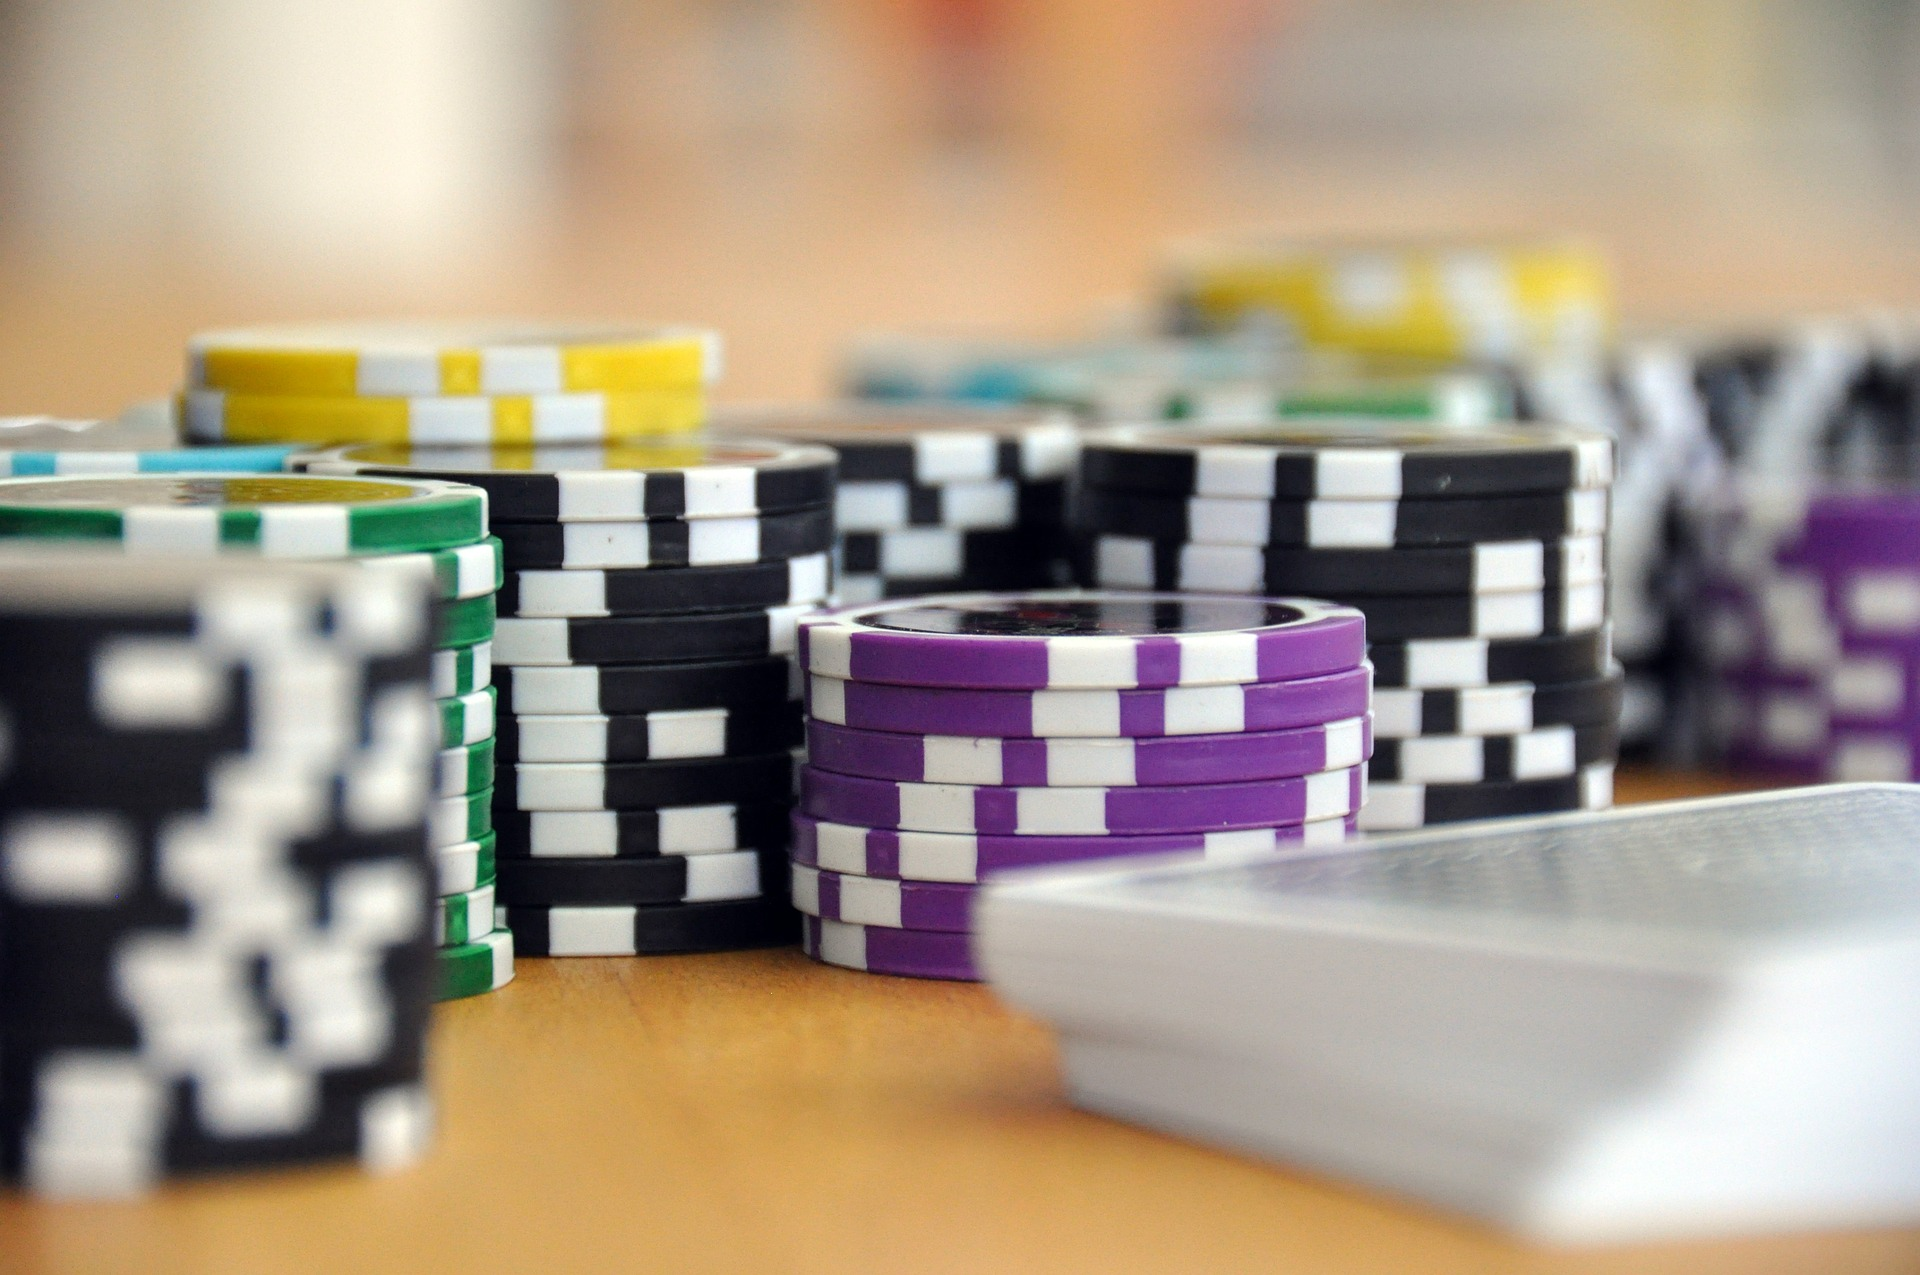 fichas, juego, casino, cartas, póker - Fondos de Pantalla HD - professor-falken.com